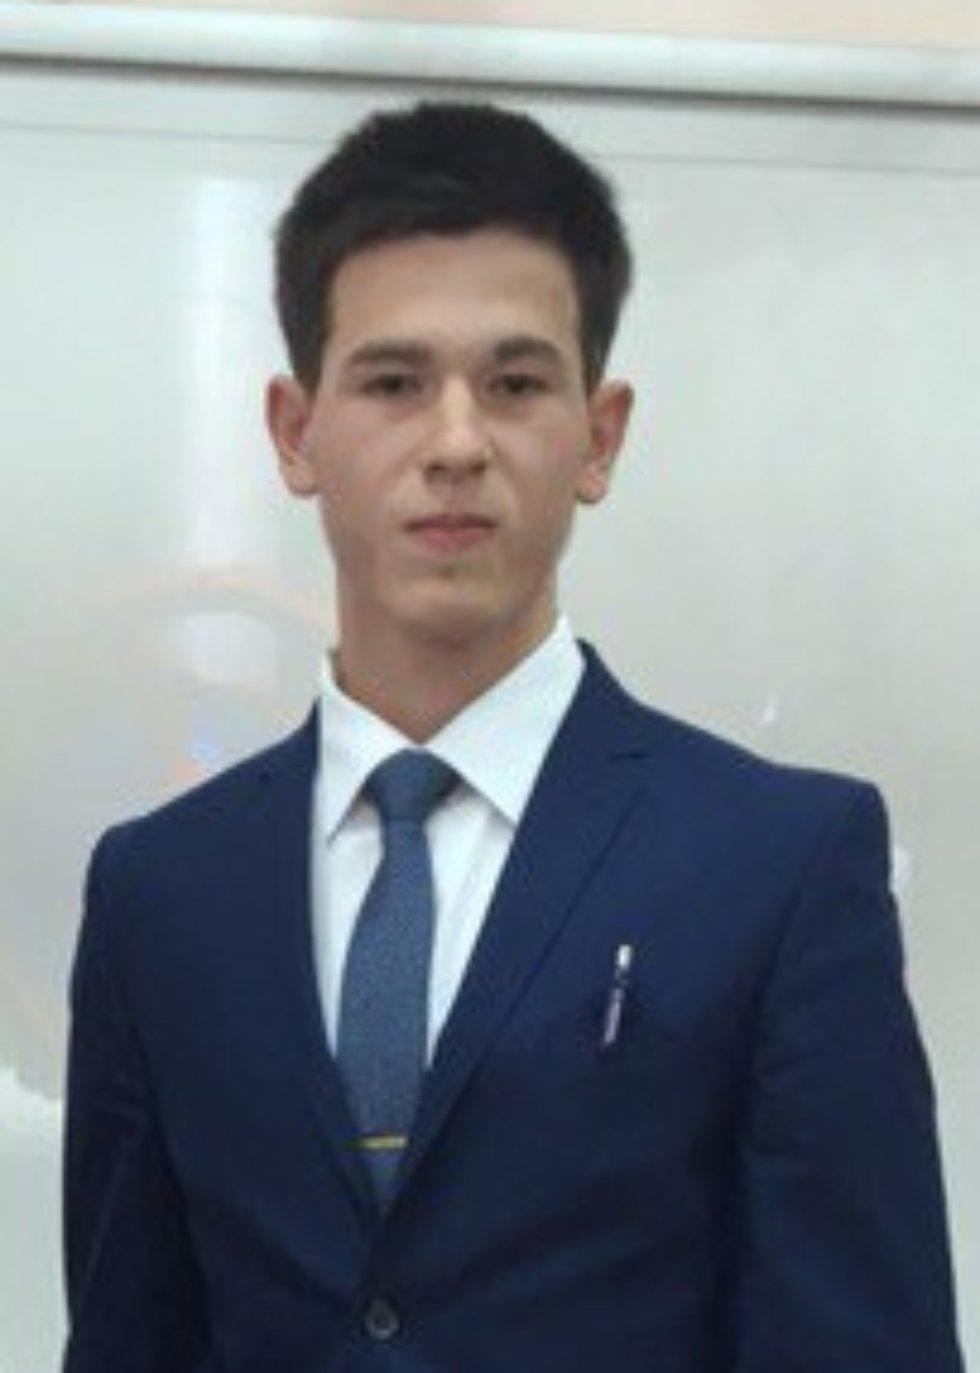 Абдуллин Альберт Радикович